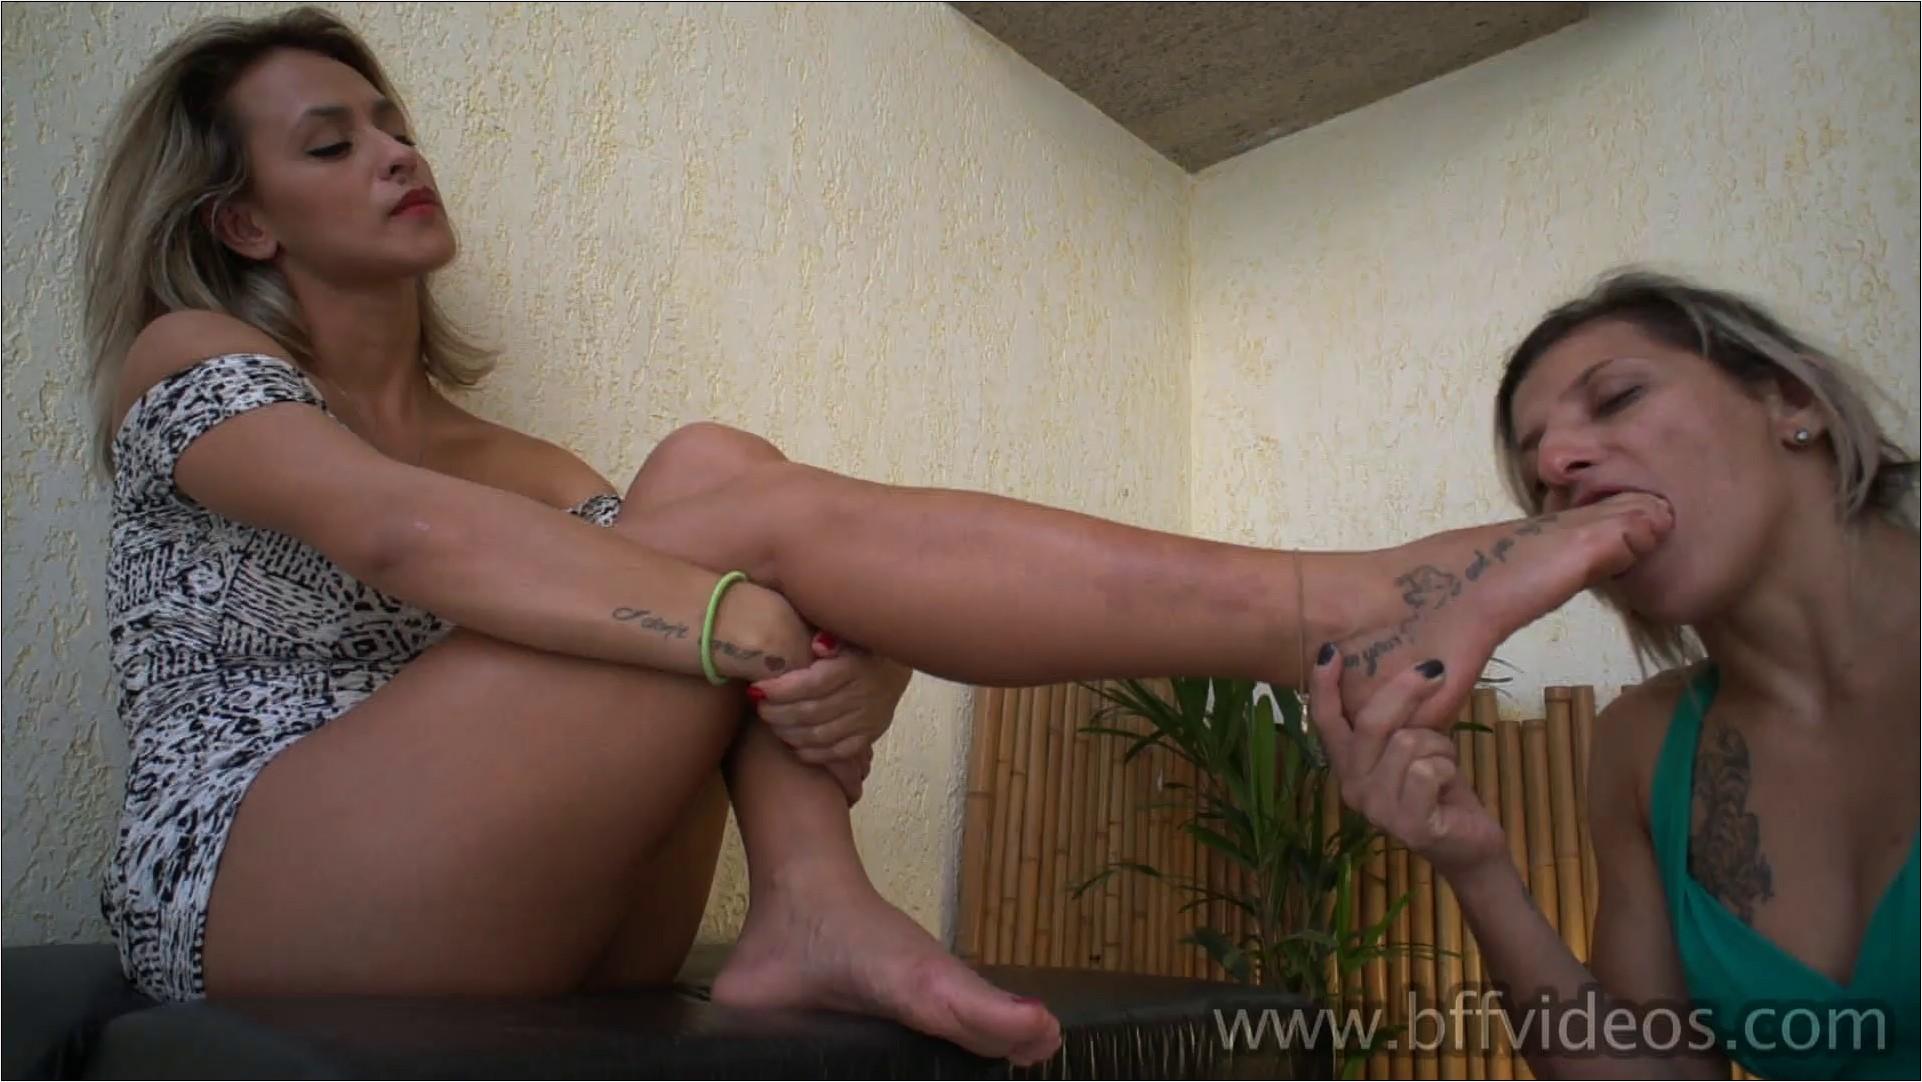 Taty First Time Under Olivia Sweaty Feet Part 3 - BFFVIDEOS / BRAZIL FETISH FILMS - FULL HD/1080p/MP4